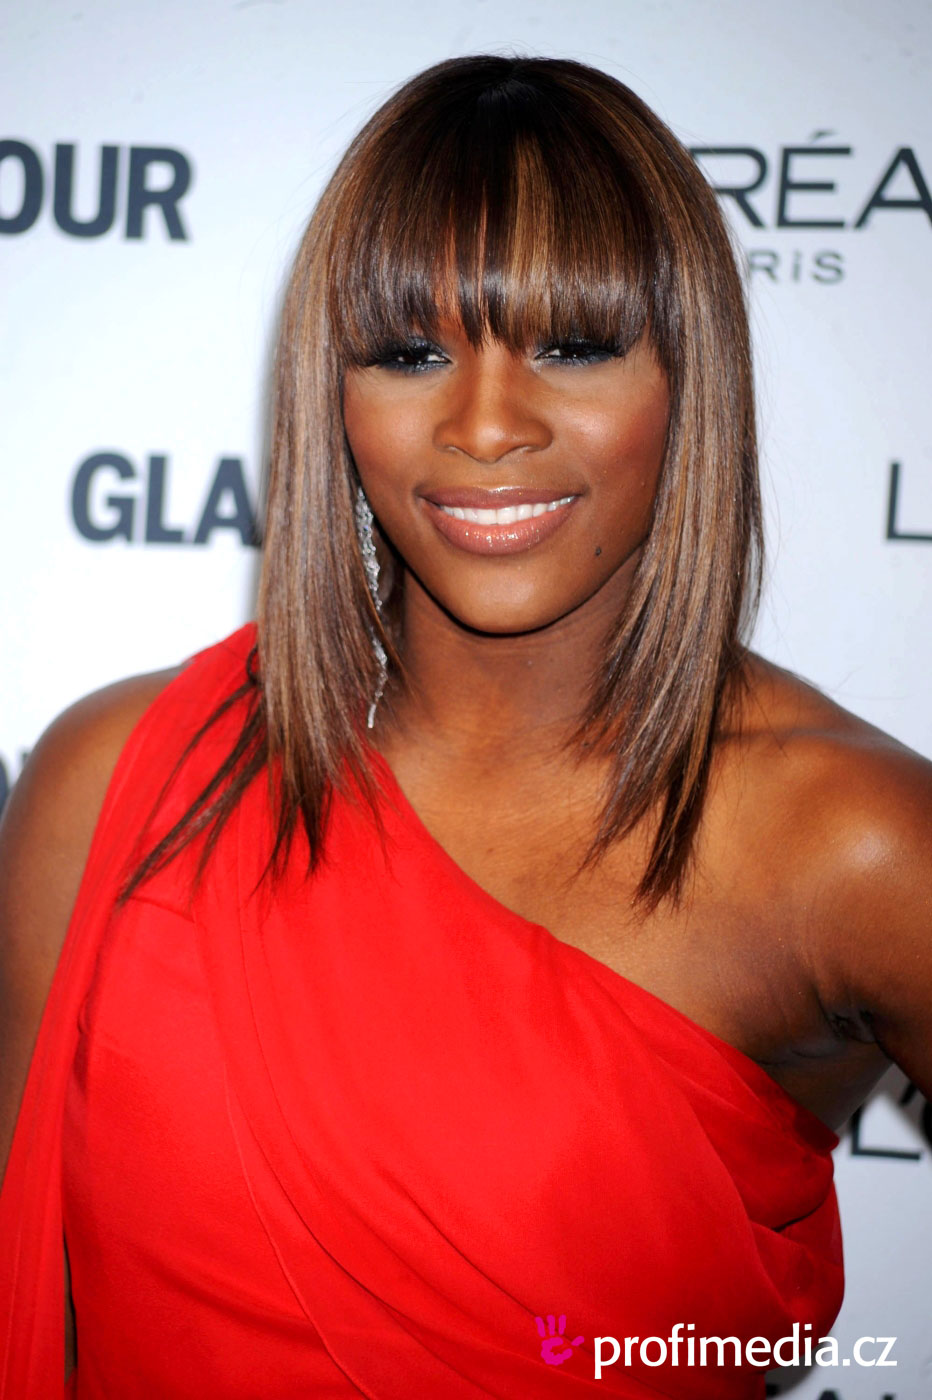 Serena Williams Biography